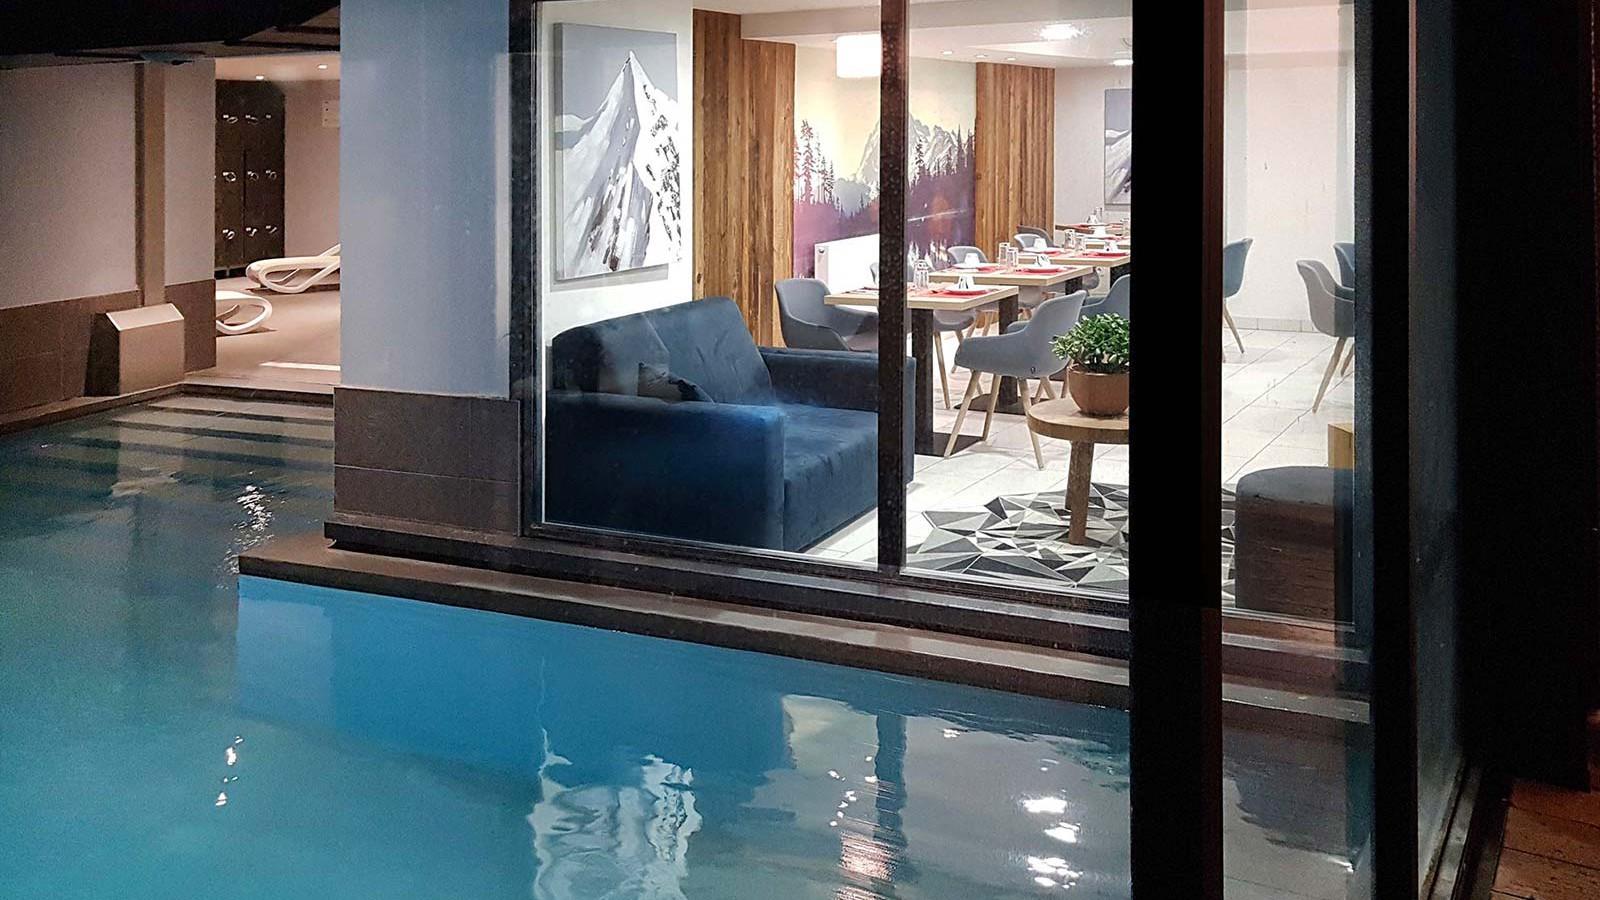 Residence Isatis - Self-catered apartment-chamonix-residence - pool